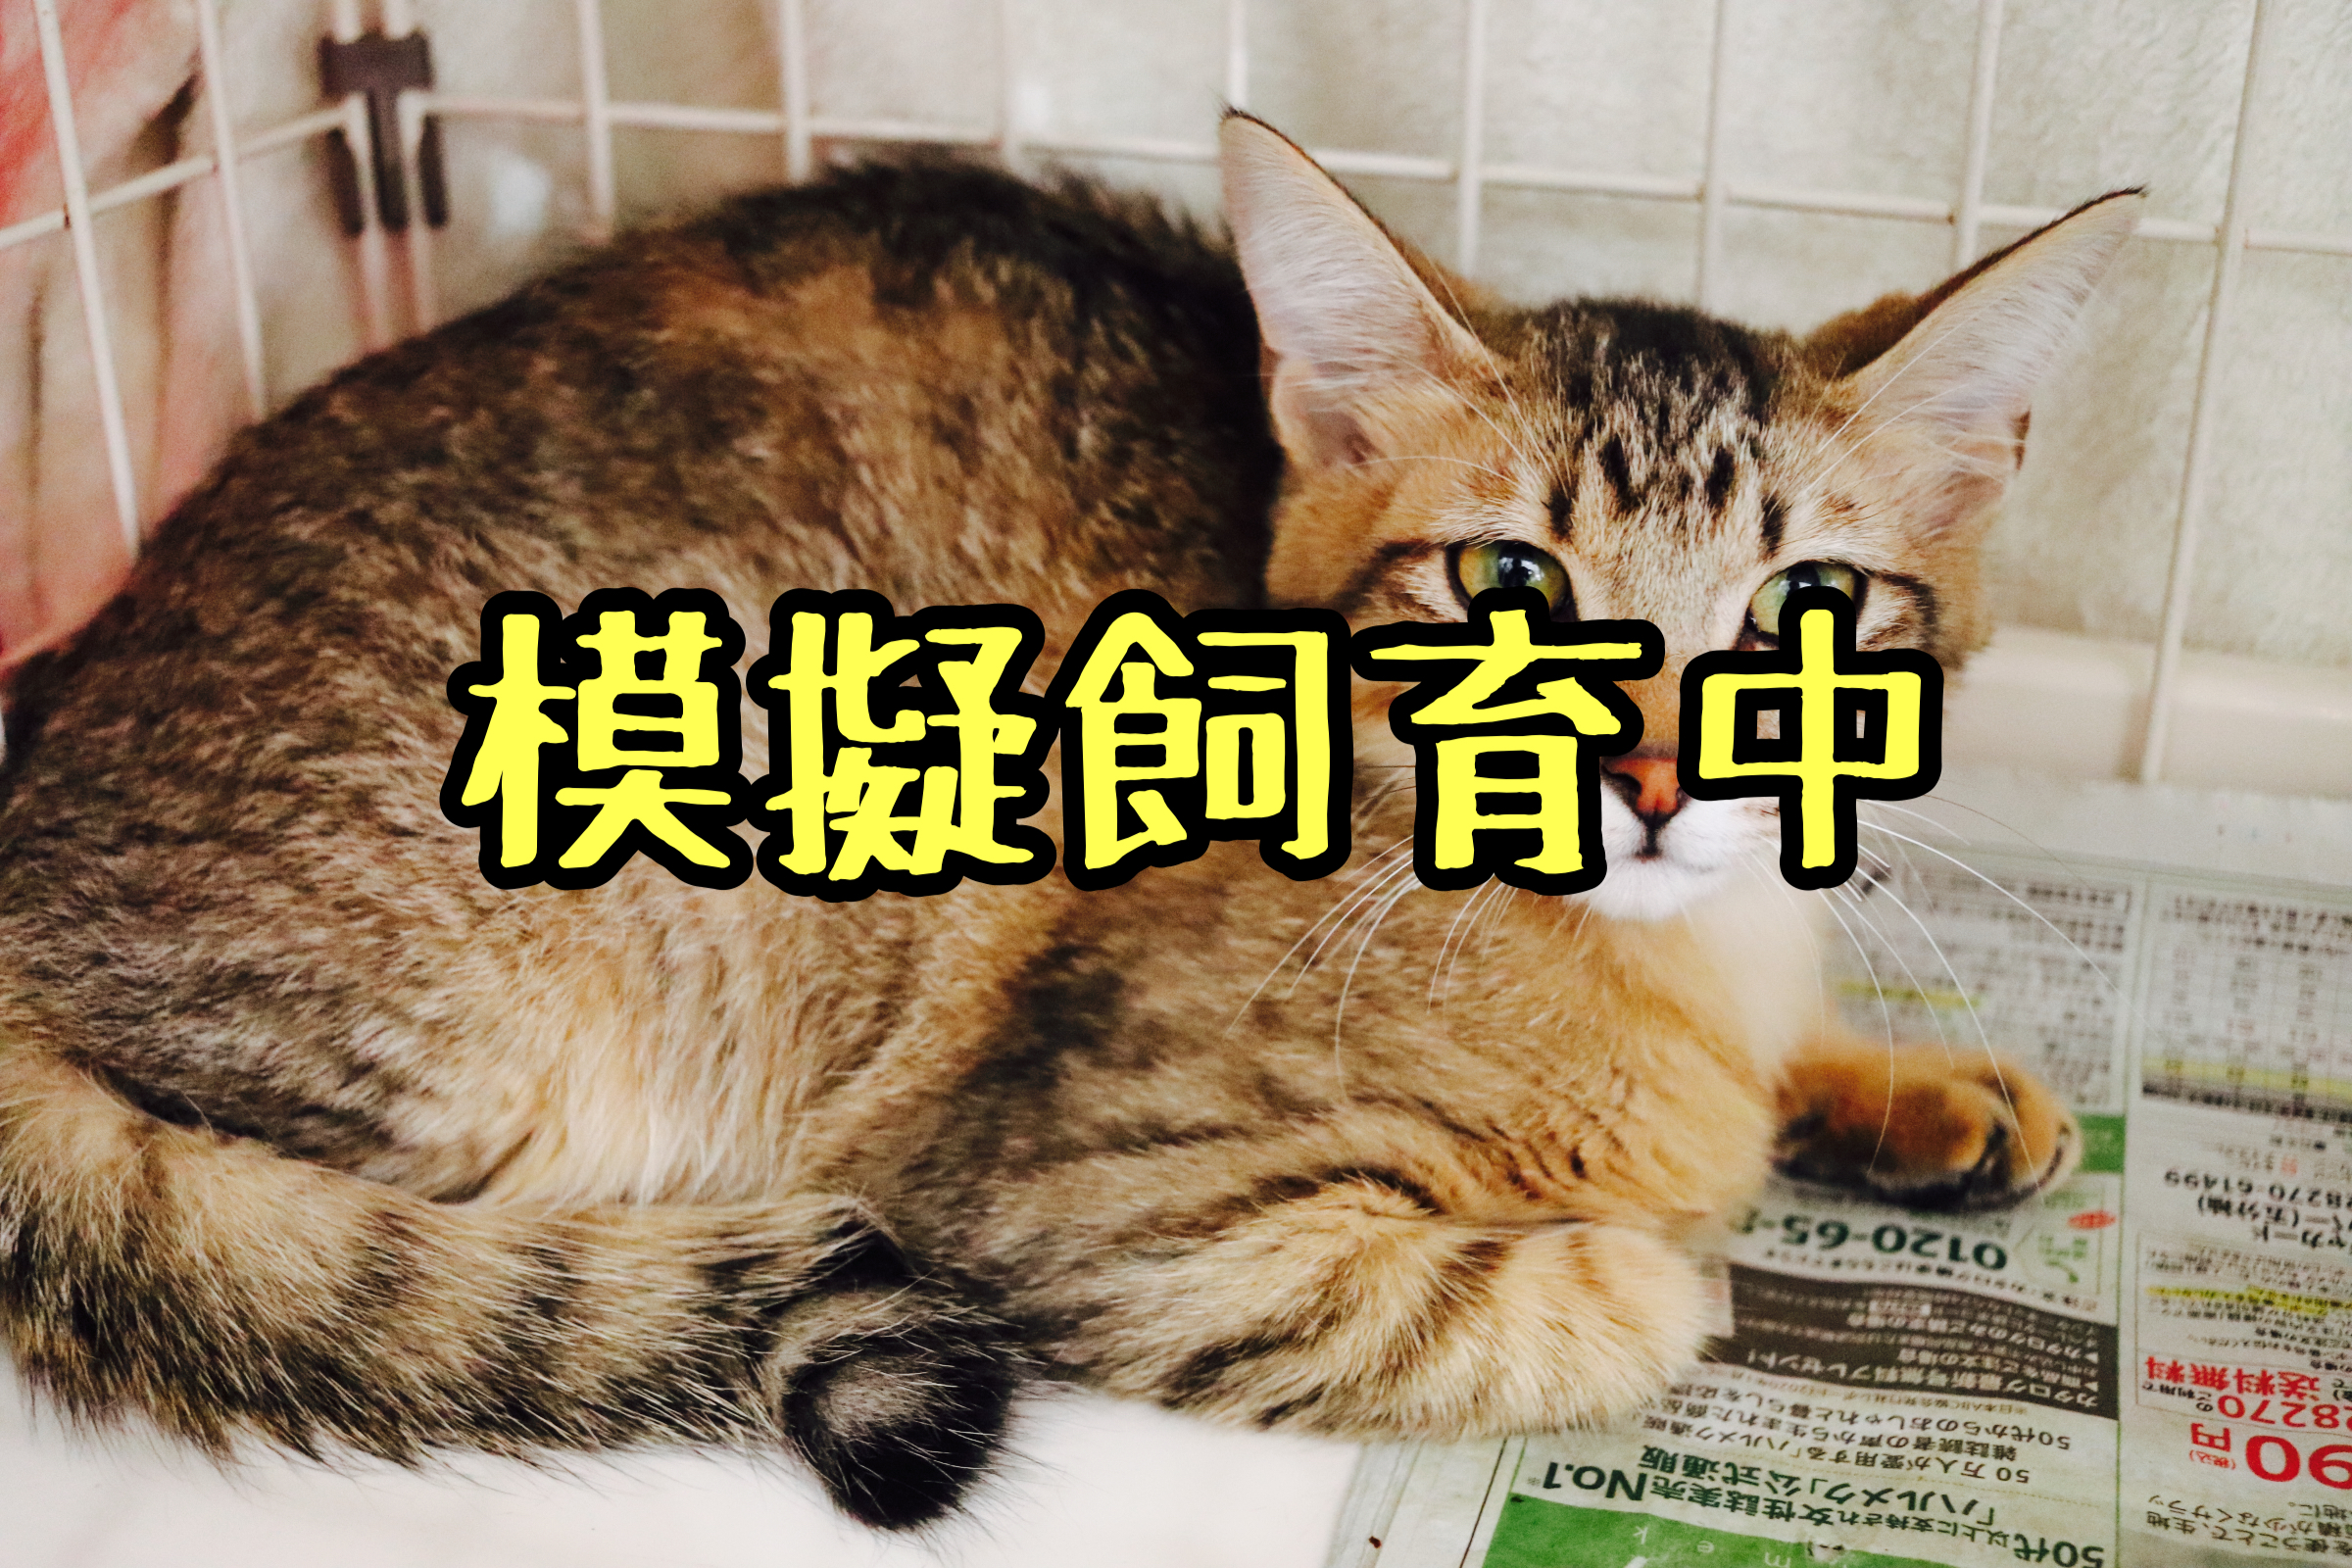 <ul> <li>猫種:日本猫</li> <li>性別:女の子</li> <li>名前:トラミ</li> <li>年齢:2021年1月21日生まれ</li> <li>保護経緯:飼い主が高齢になり認知症のため飼育困難</li> </ul>